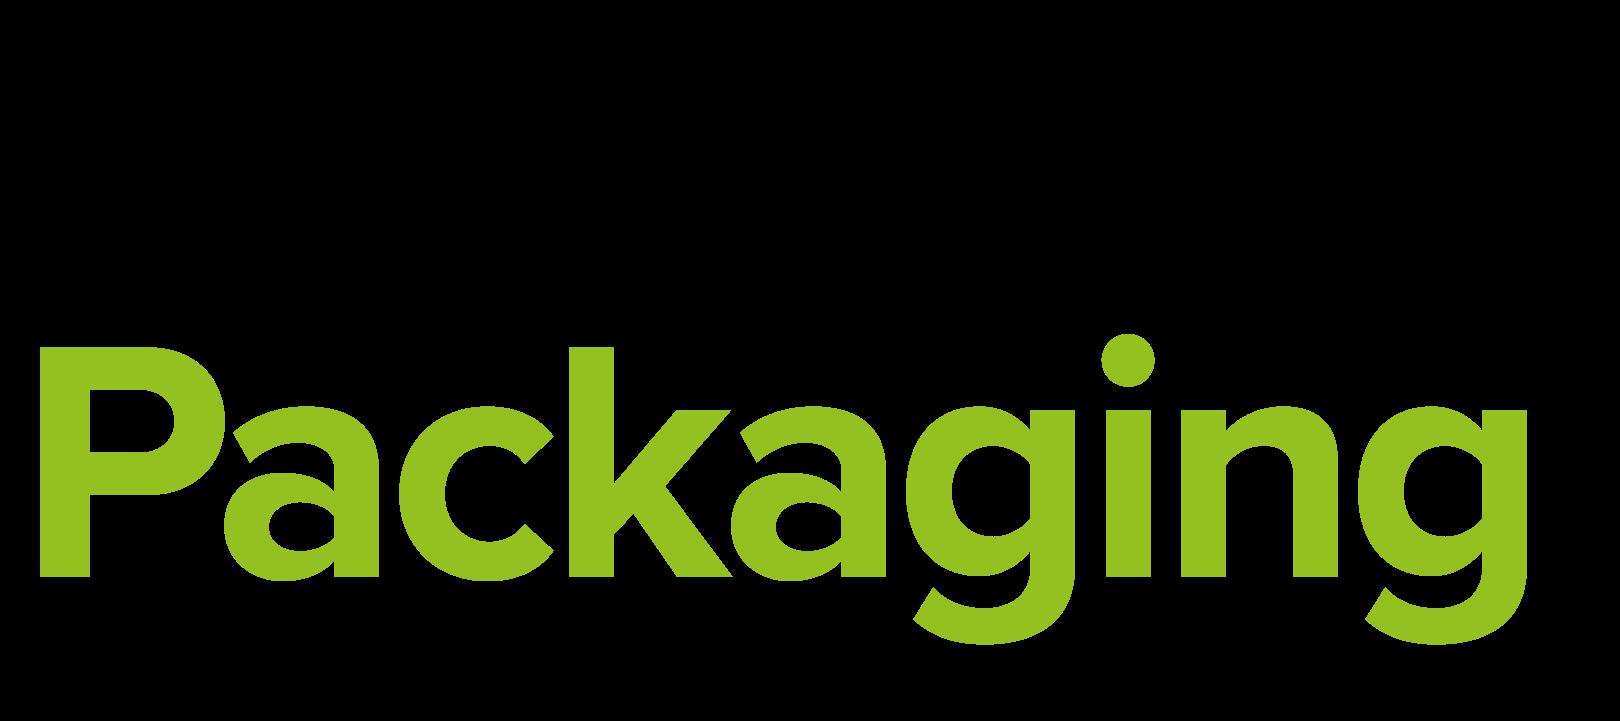 Design Packaging - Logo